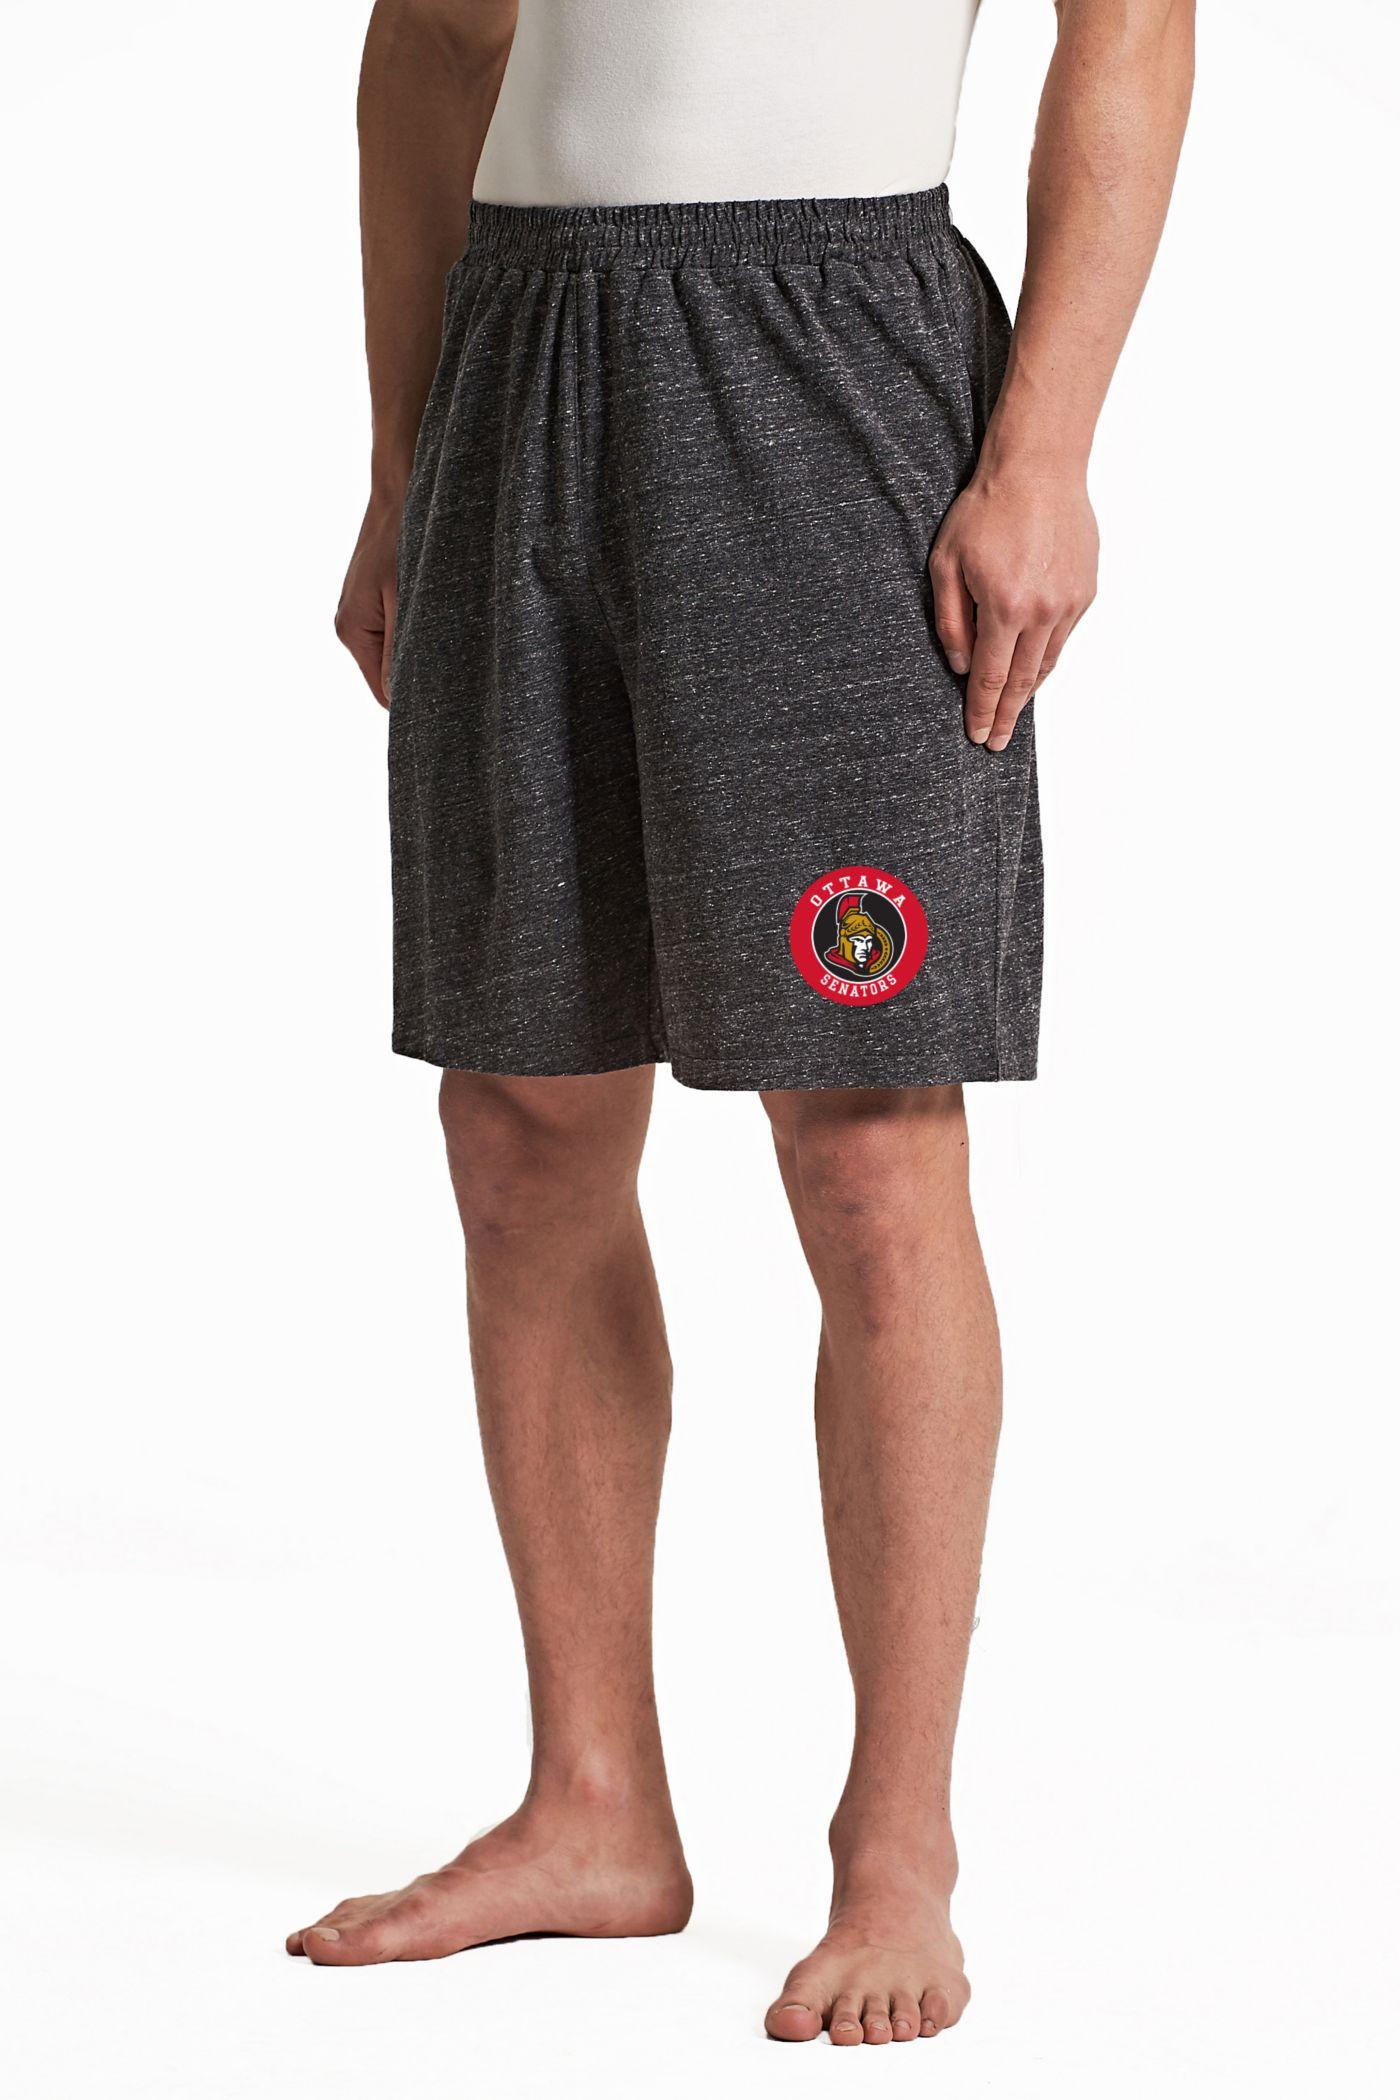 Concepts Sport Men's Ottawa Senators Pitch Grey Shorts